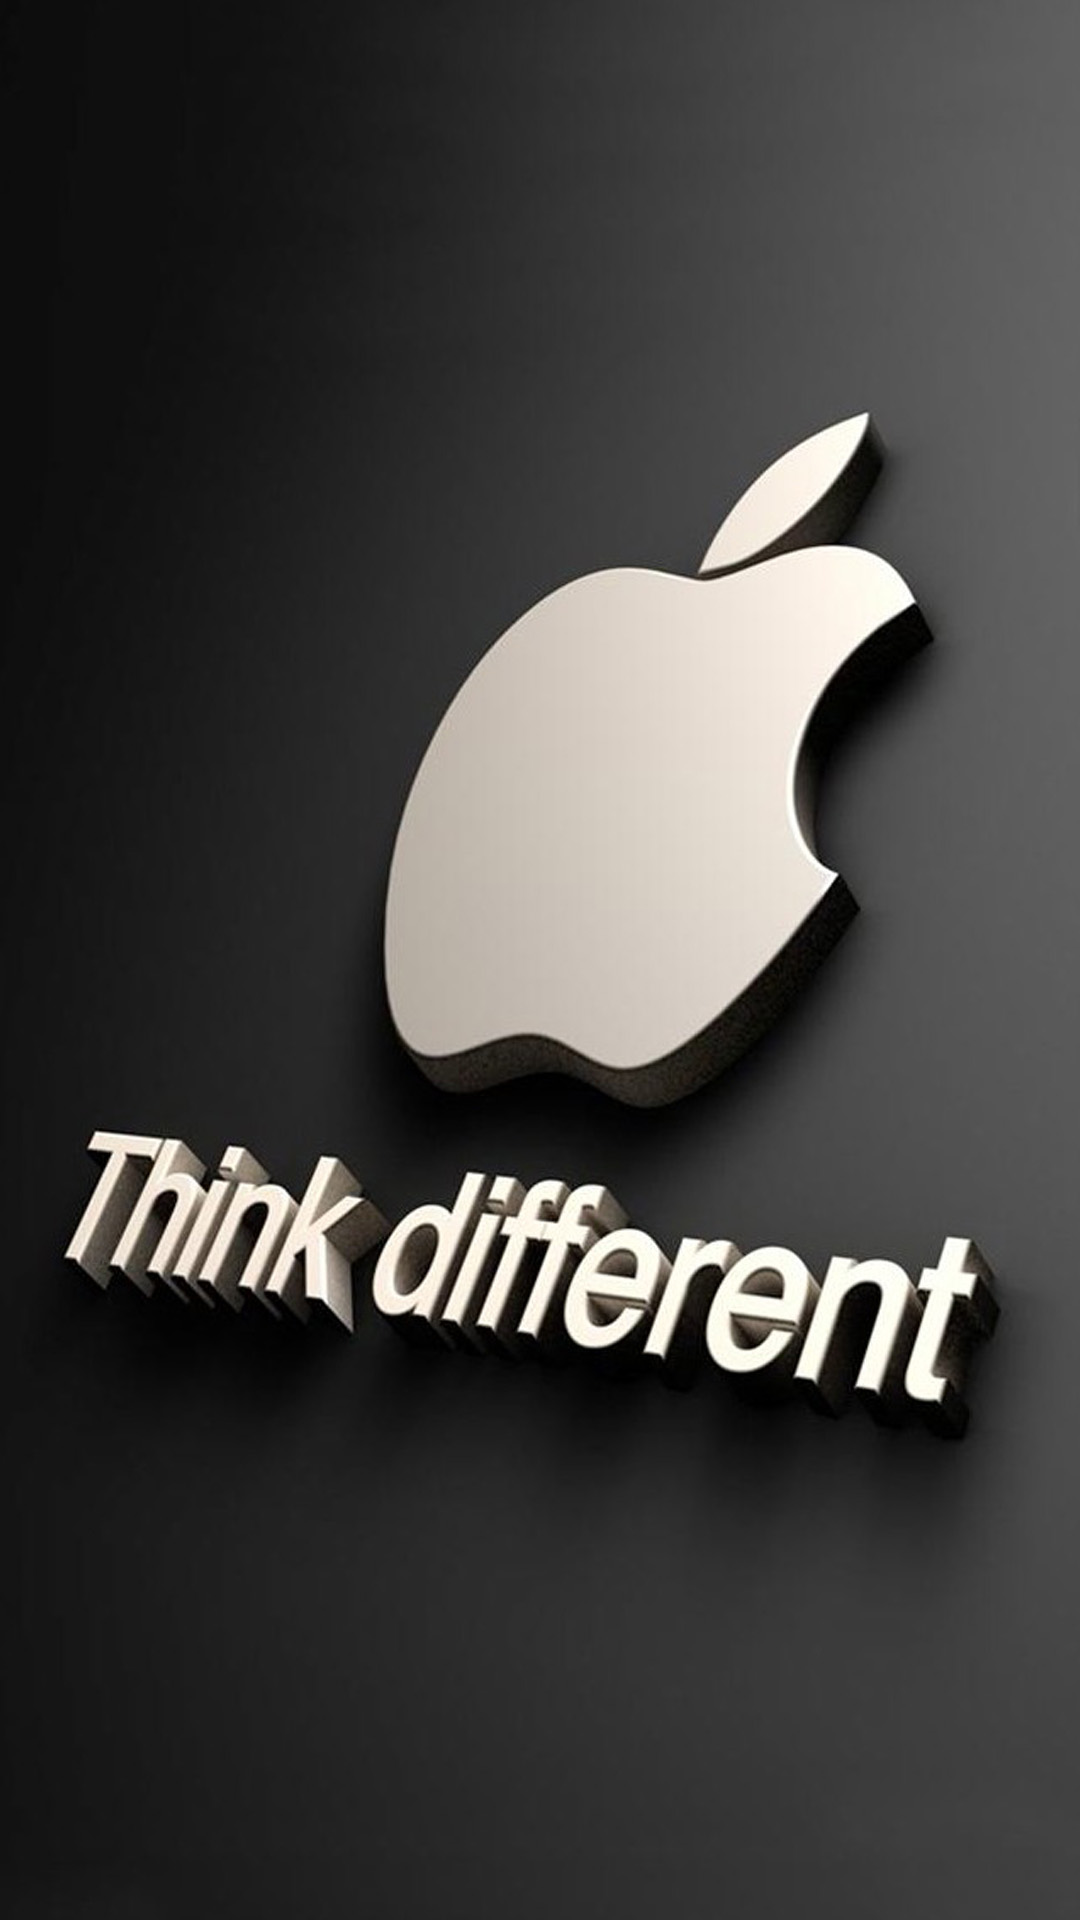 Apple iPhone 6 Plus Wallpaper 164 iPhone 6 Plus Wallpapers HD 1080x1920